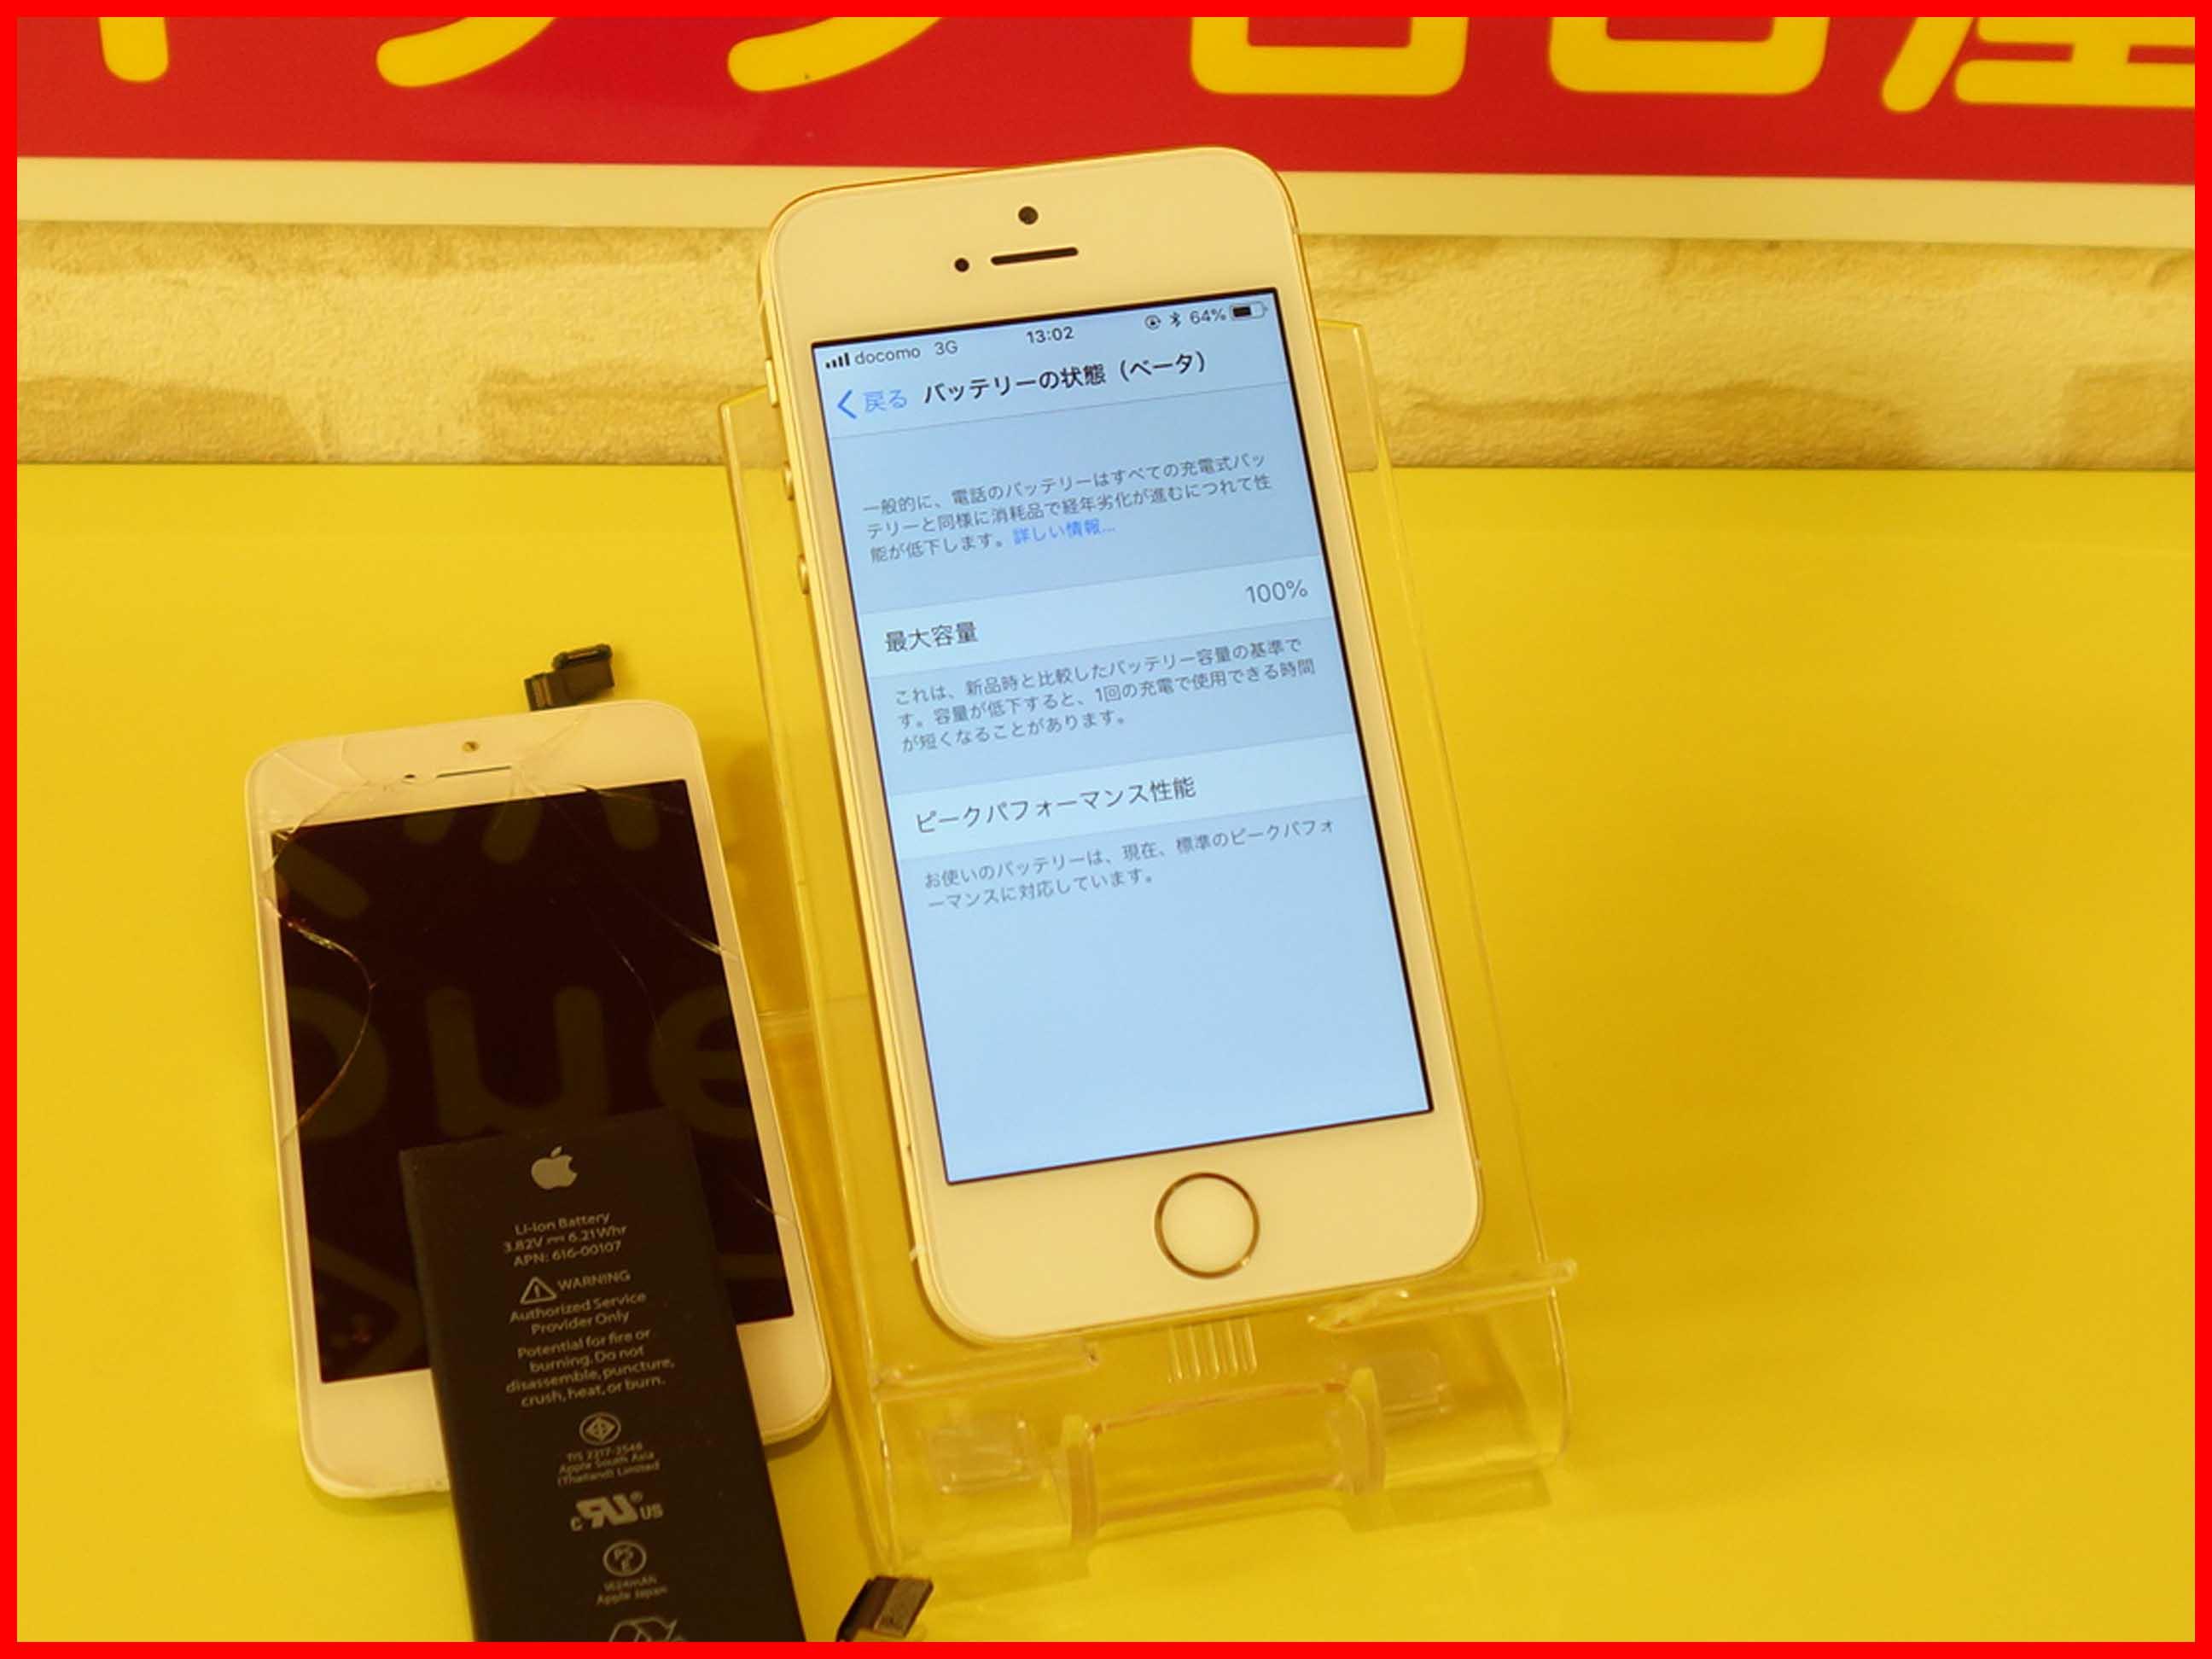 iPhoneSEの液晶修理に一宮市よりご来店!アイフォン修理のクイック名古屋